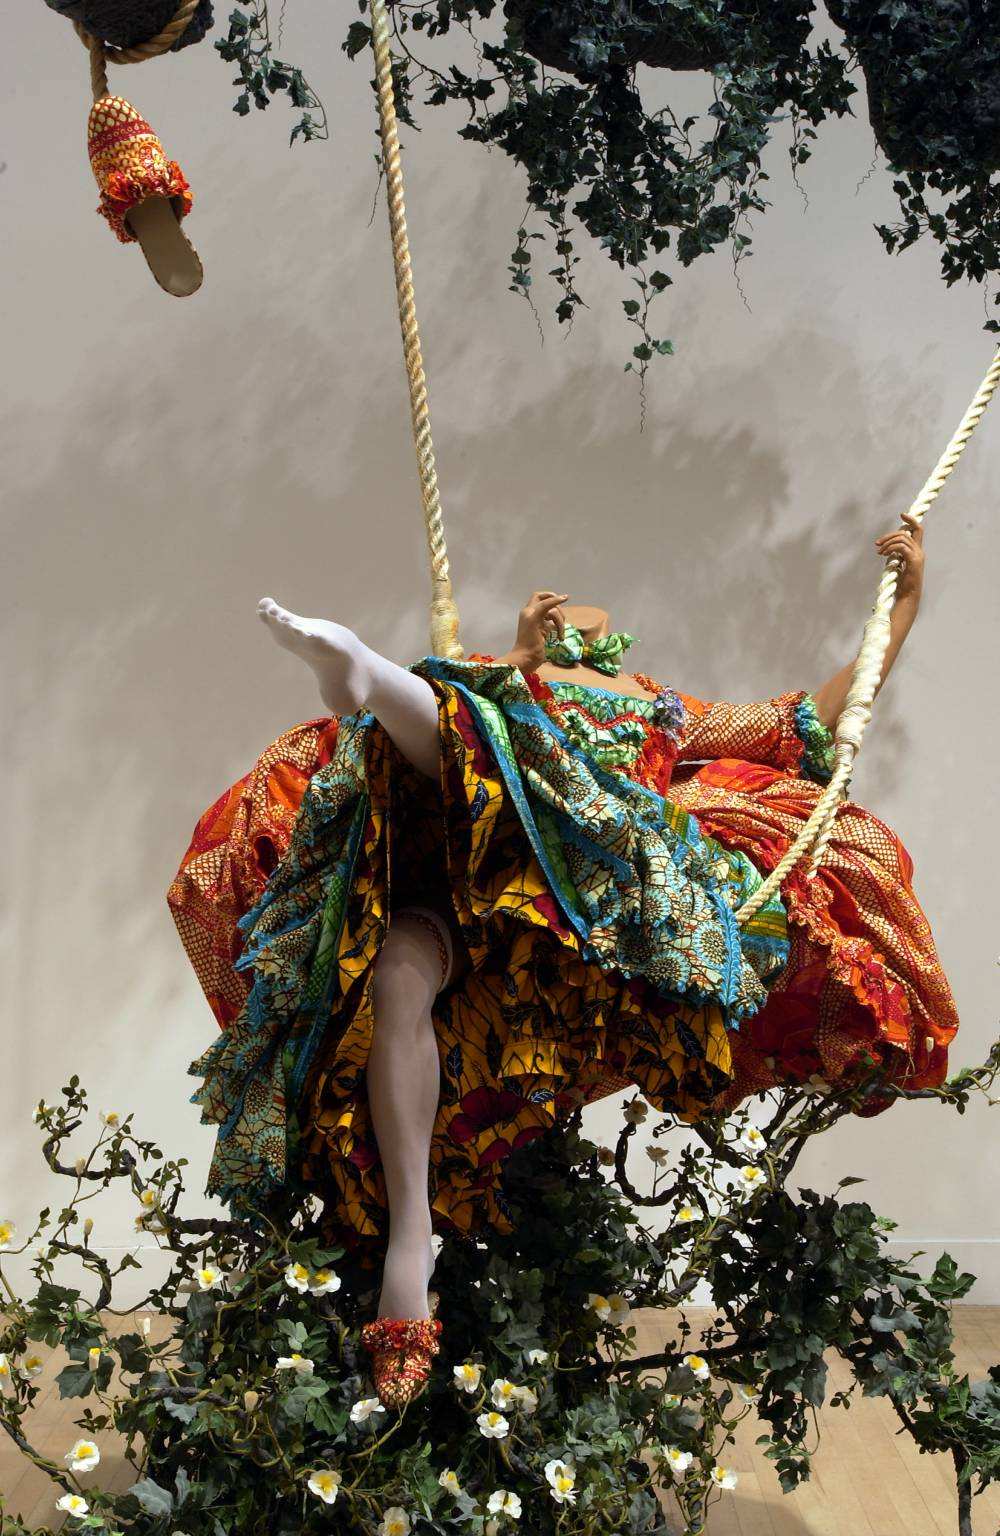 The Swing (after Fragonard) 2001 by Yinka Shonibare, MBE born 1962